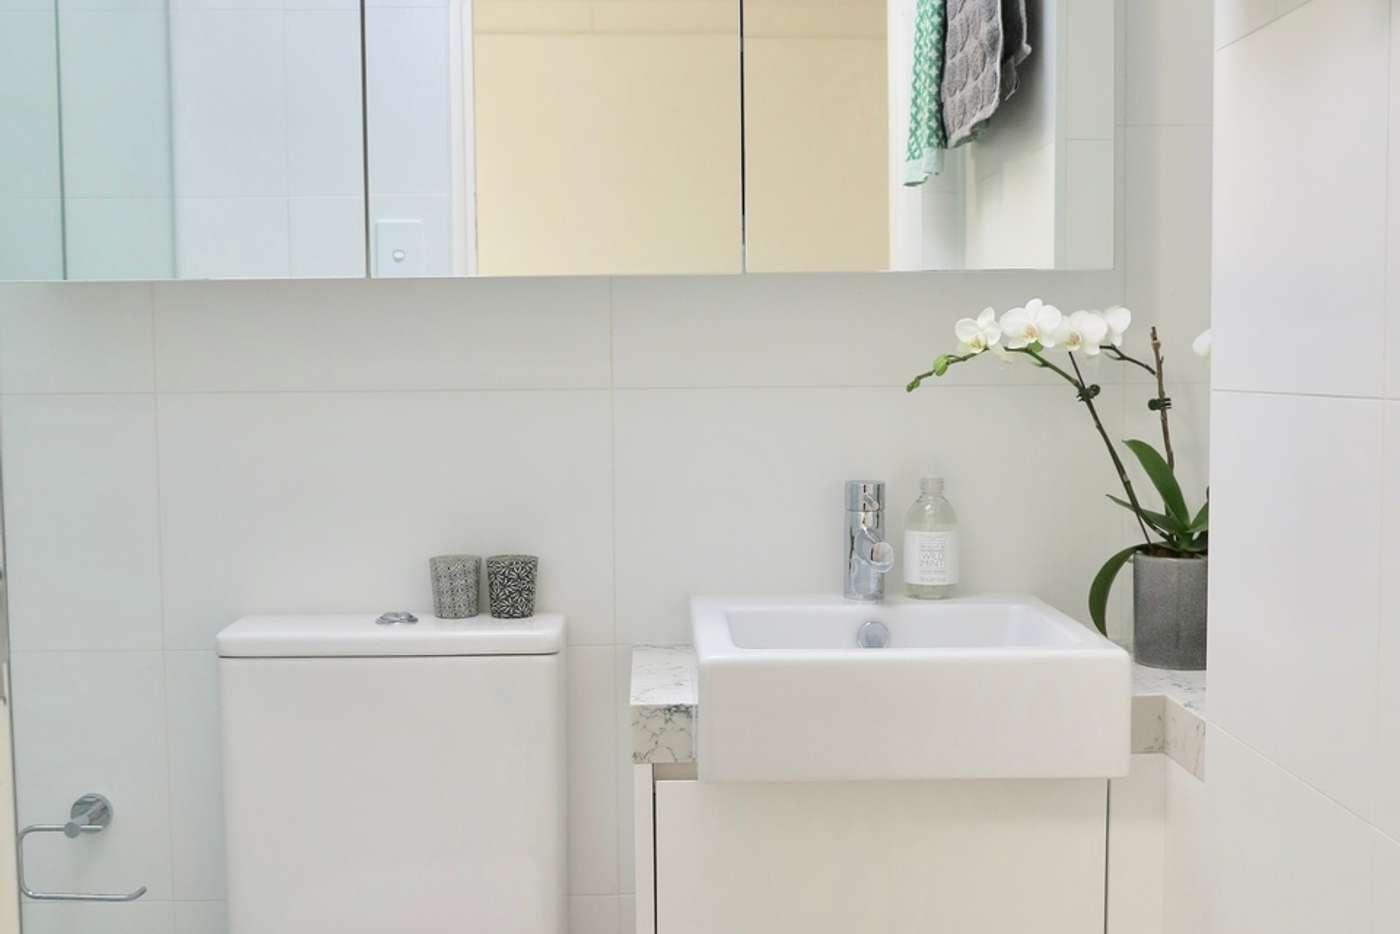 Seventh view of Homely apartment listing, 13/66 Beach Road, Bondi Beach NSW 2026